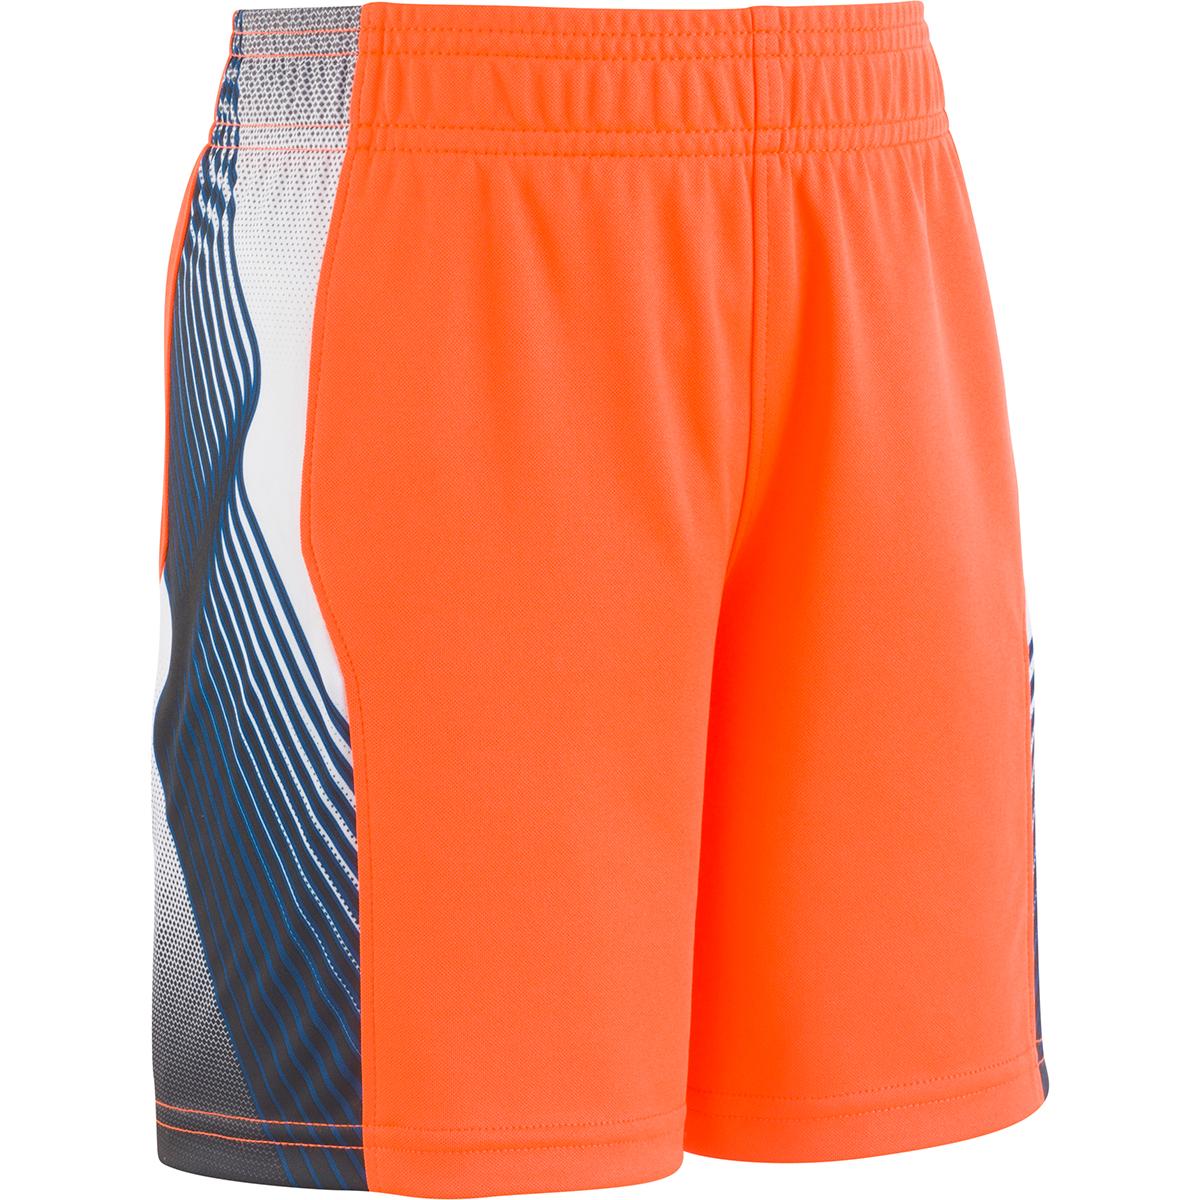 Under Armour Little Boys' Ua Space The Floor Basketball Shorts - Orange, 5